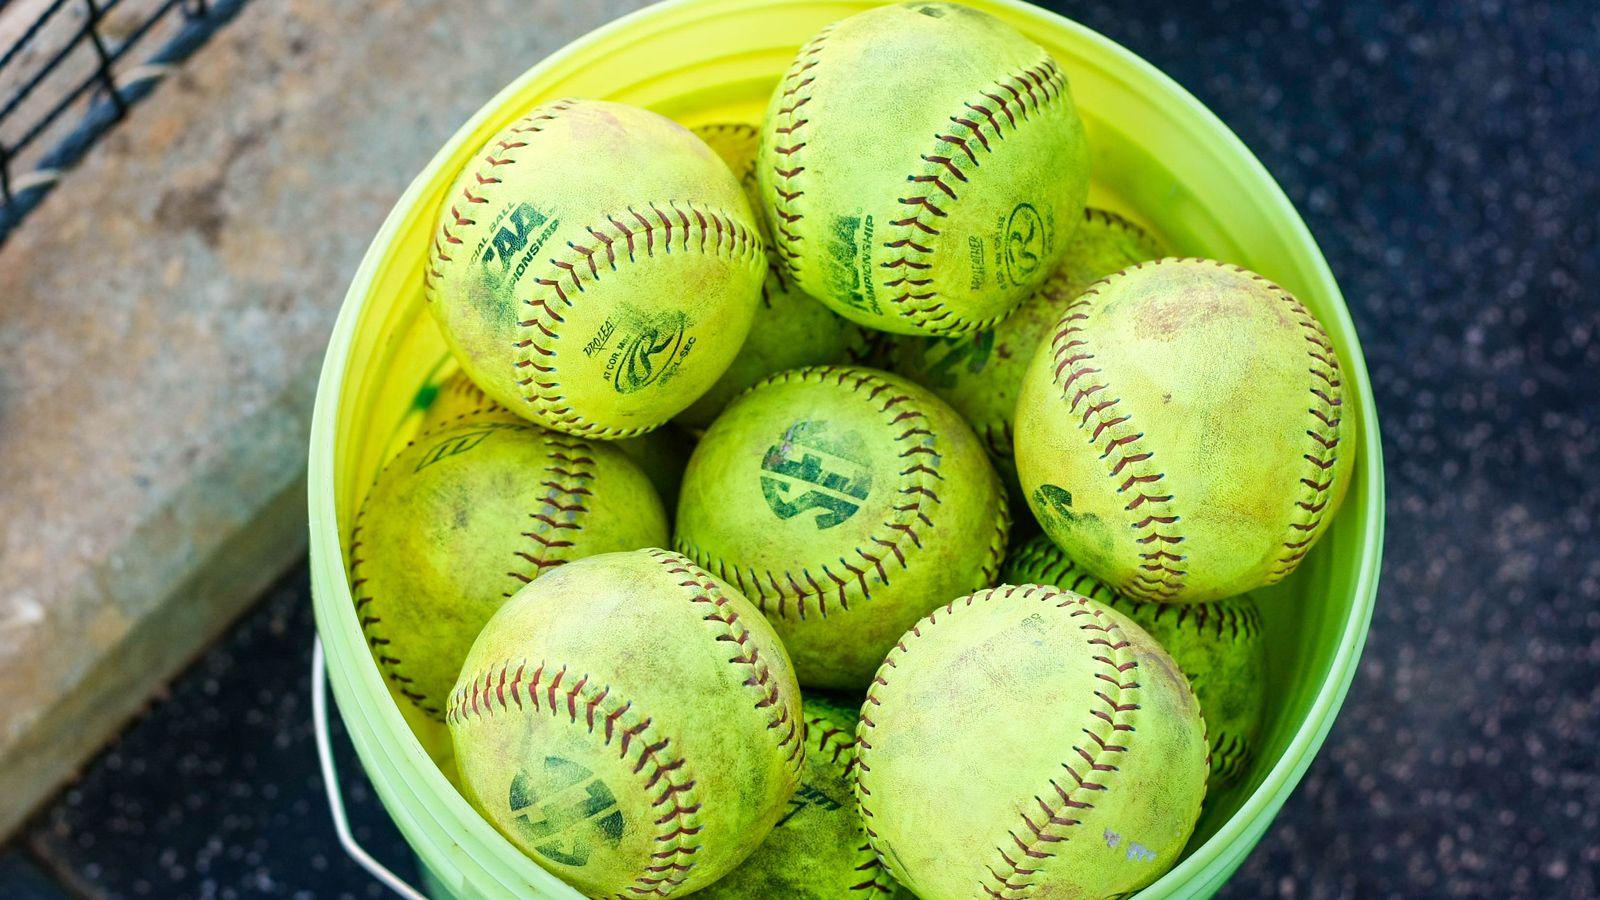 110 from SEC softball programs named Scholar-Athletes